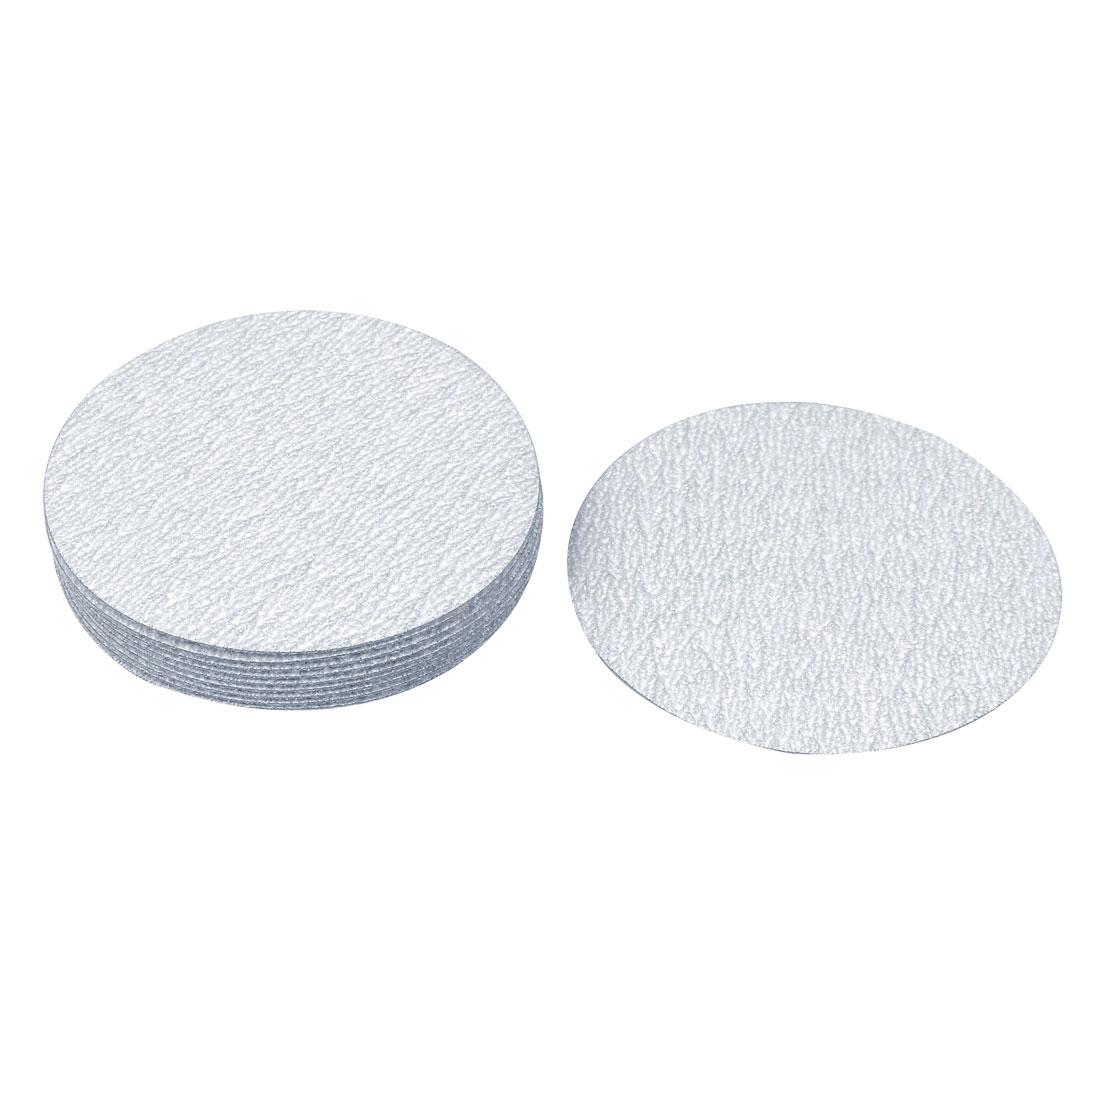 "3"" Dia Polishing Round Dry Abrasive Sanding Sandpaper Sheet Disc 400 Grit 10 Pcs"